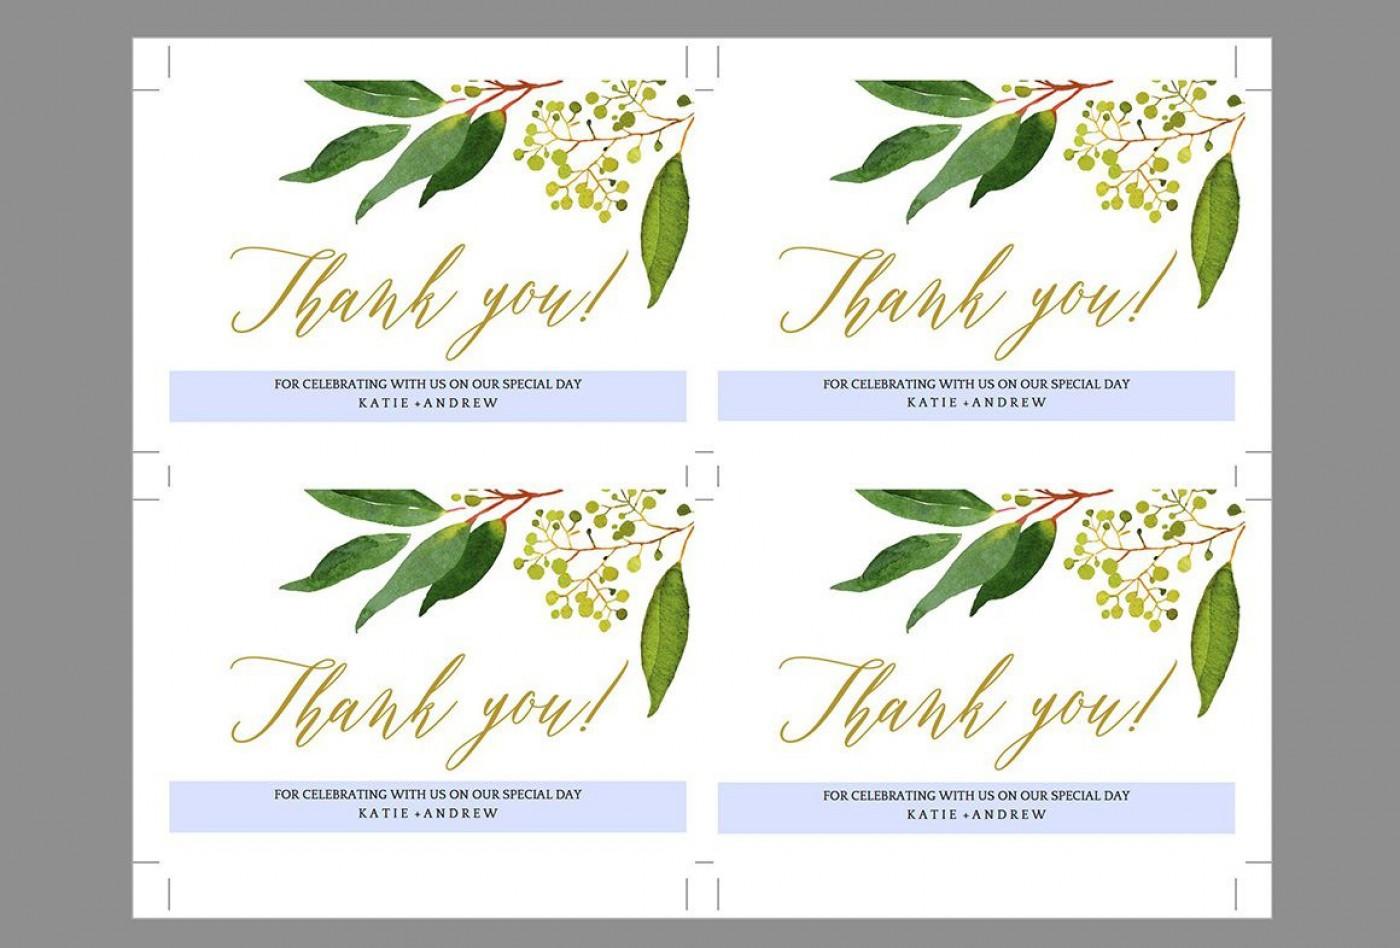 009 Shocking Wedding Thank You Card Template Inspiration  Photoshop Word Etsy1400